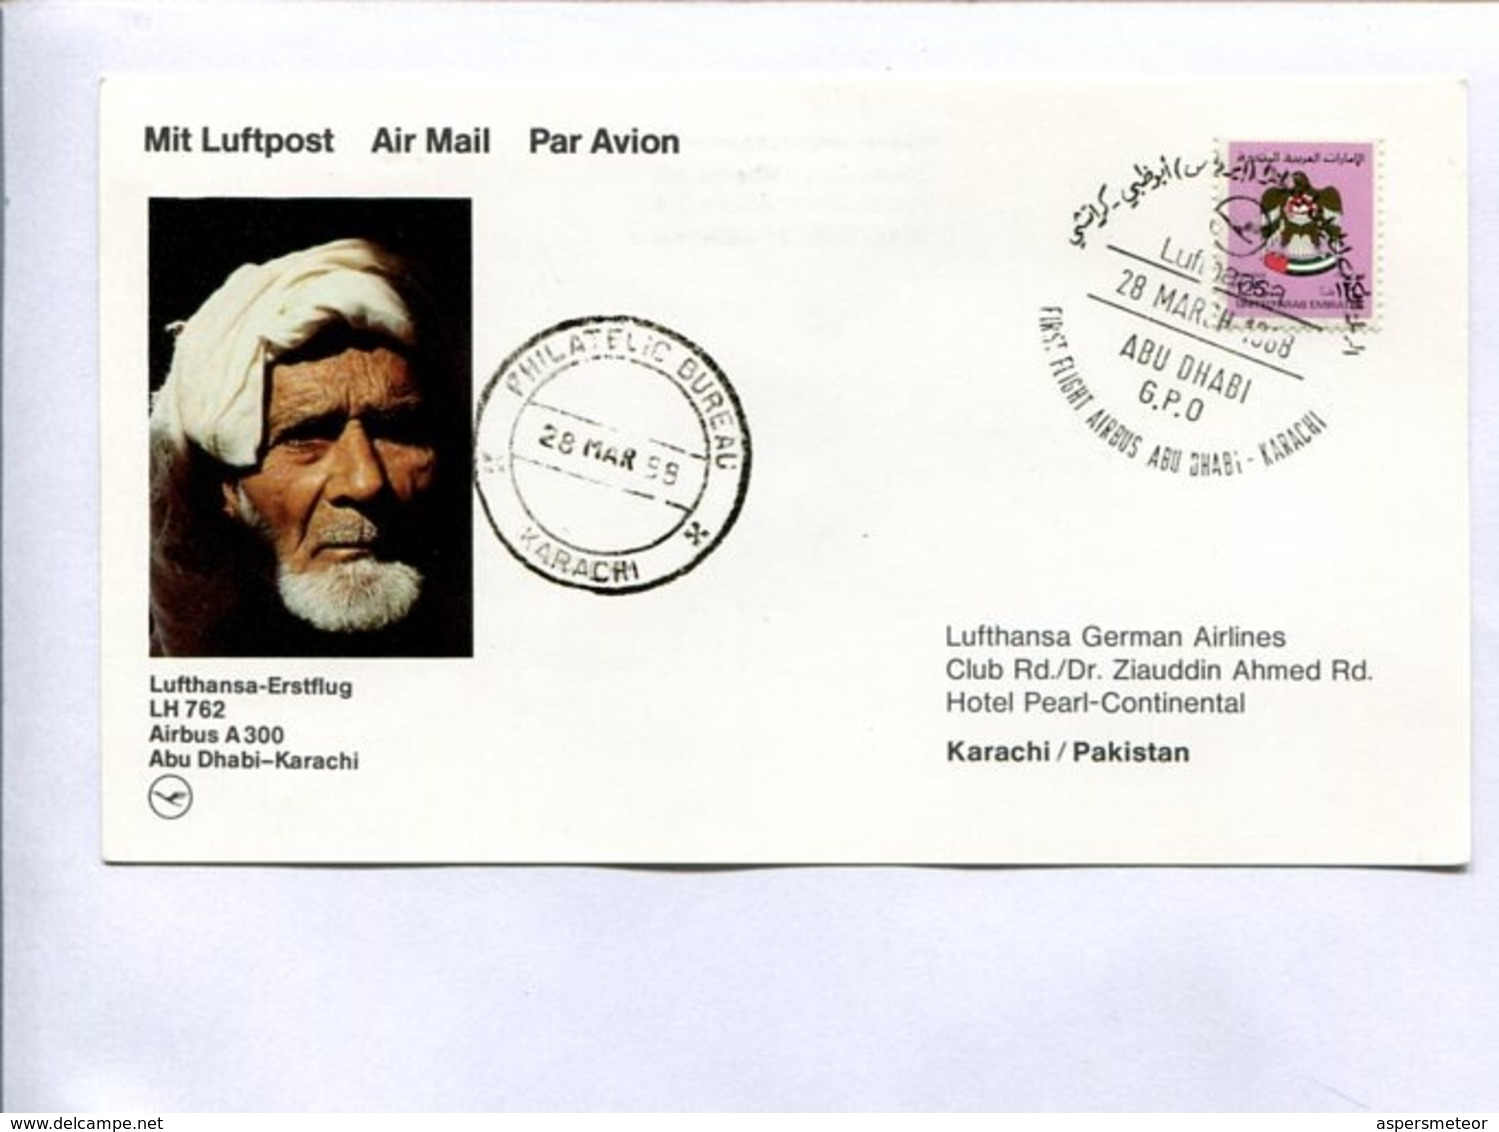 FIRST FLIGHT - MIT LUFTPOST, LUFTHANSA-ERSTFLUG ABU DHABI - KARACHI 28.3.1989. UNITED ARAB EMINATES CARD AIR MAIL -LILHU - Abu Dhabi